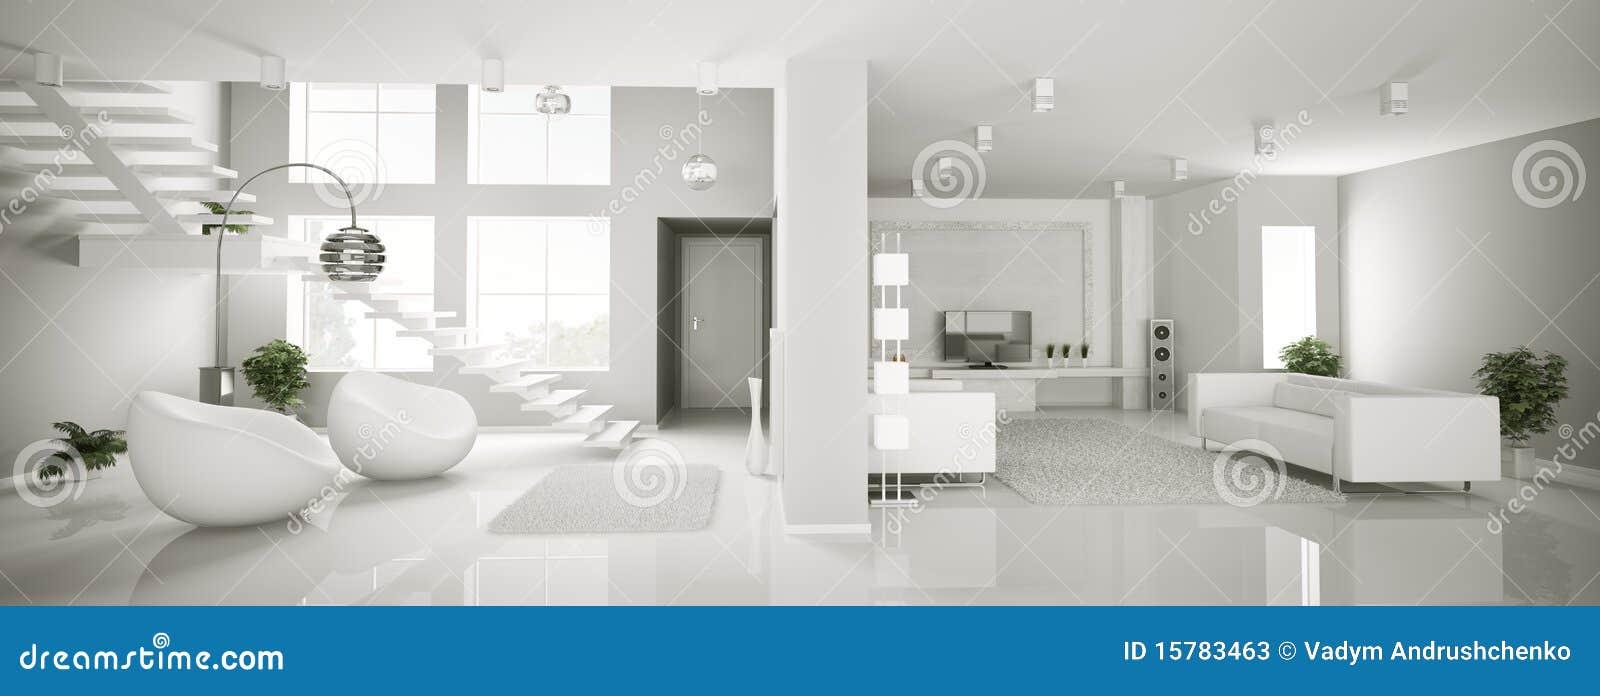 белизна панорамы квартиры 3d нутряная